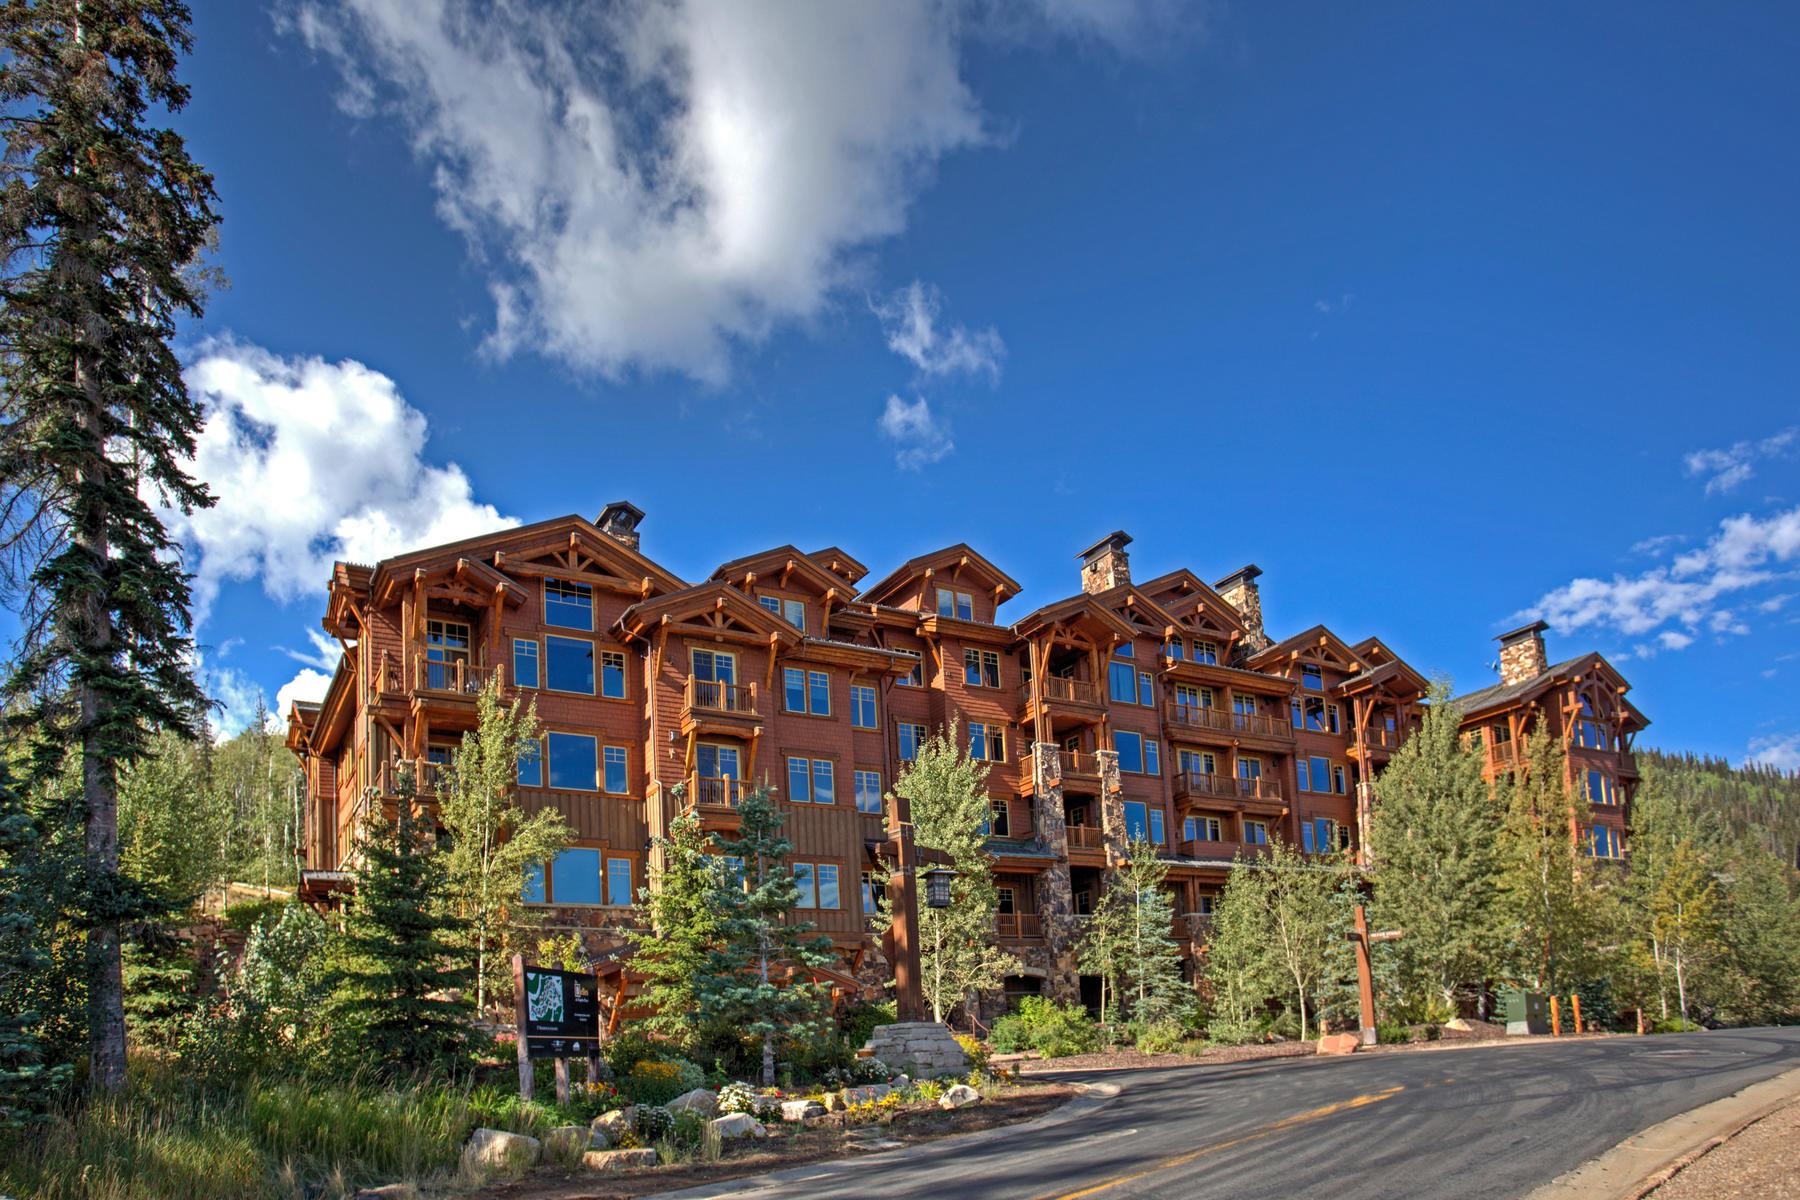 Copropriété pour l Vente à Beautifully Updated Residence with Ski Access and Amazing Views 8777 Marsac Ave #301 Park City, Utah, 84060 États-Unis